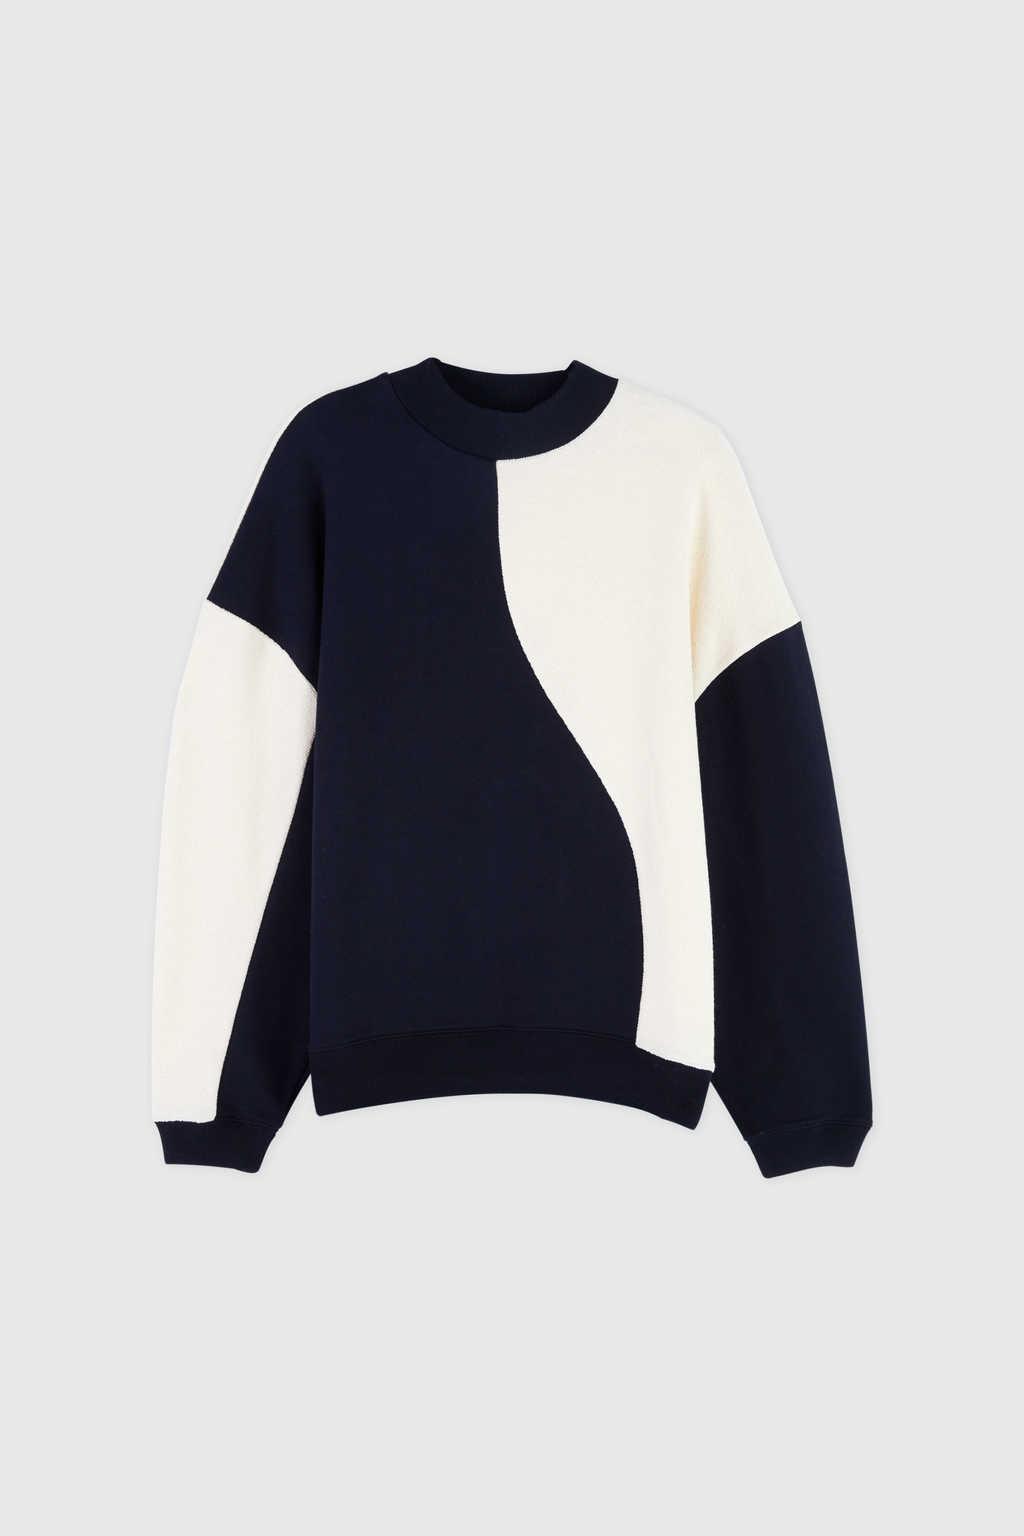 Sweatshirt 20122019 Cream 5